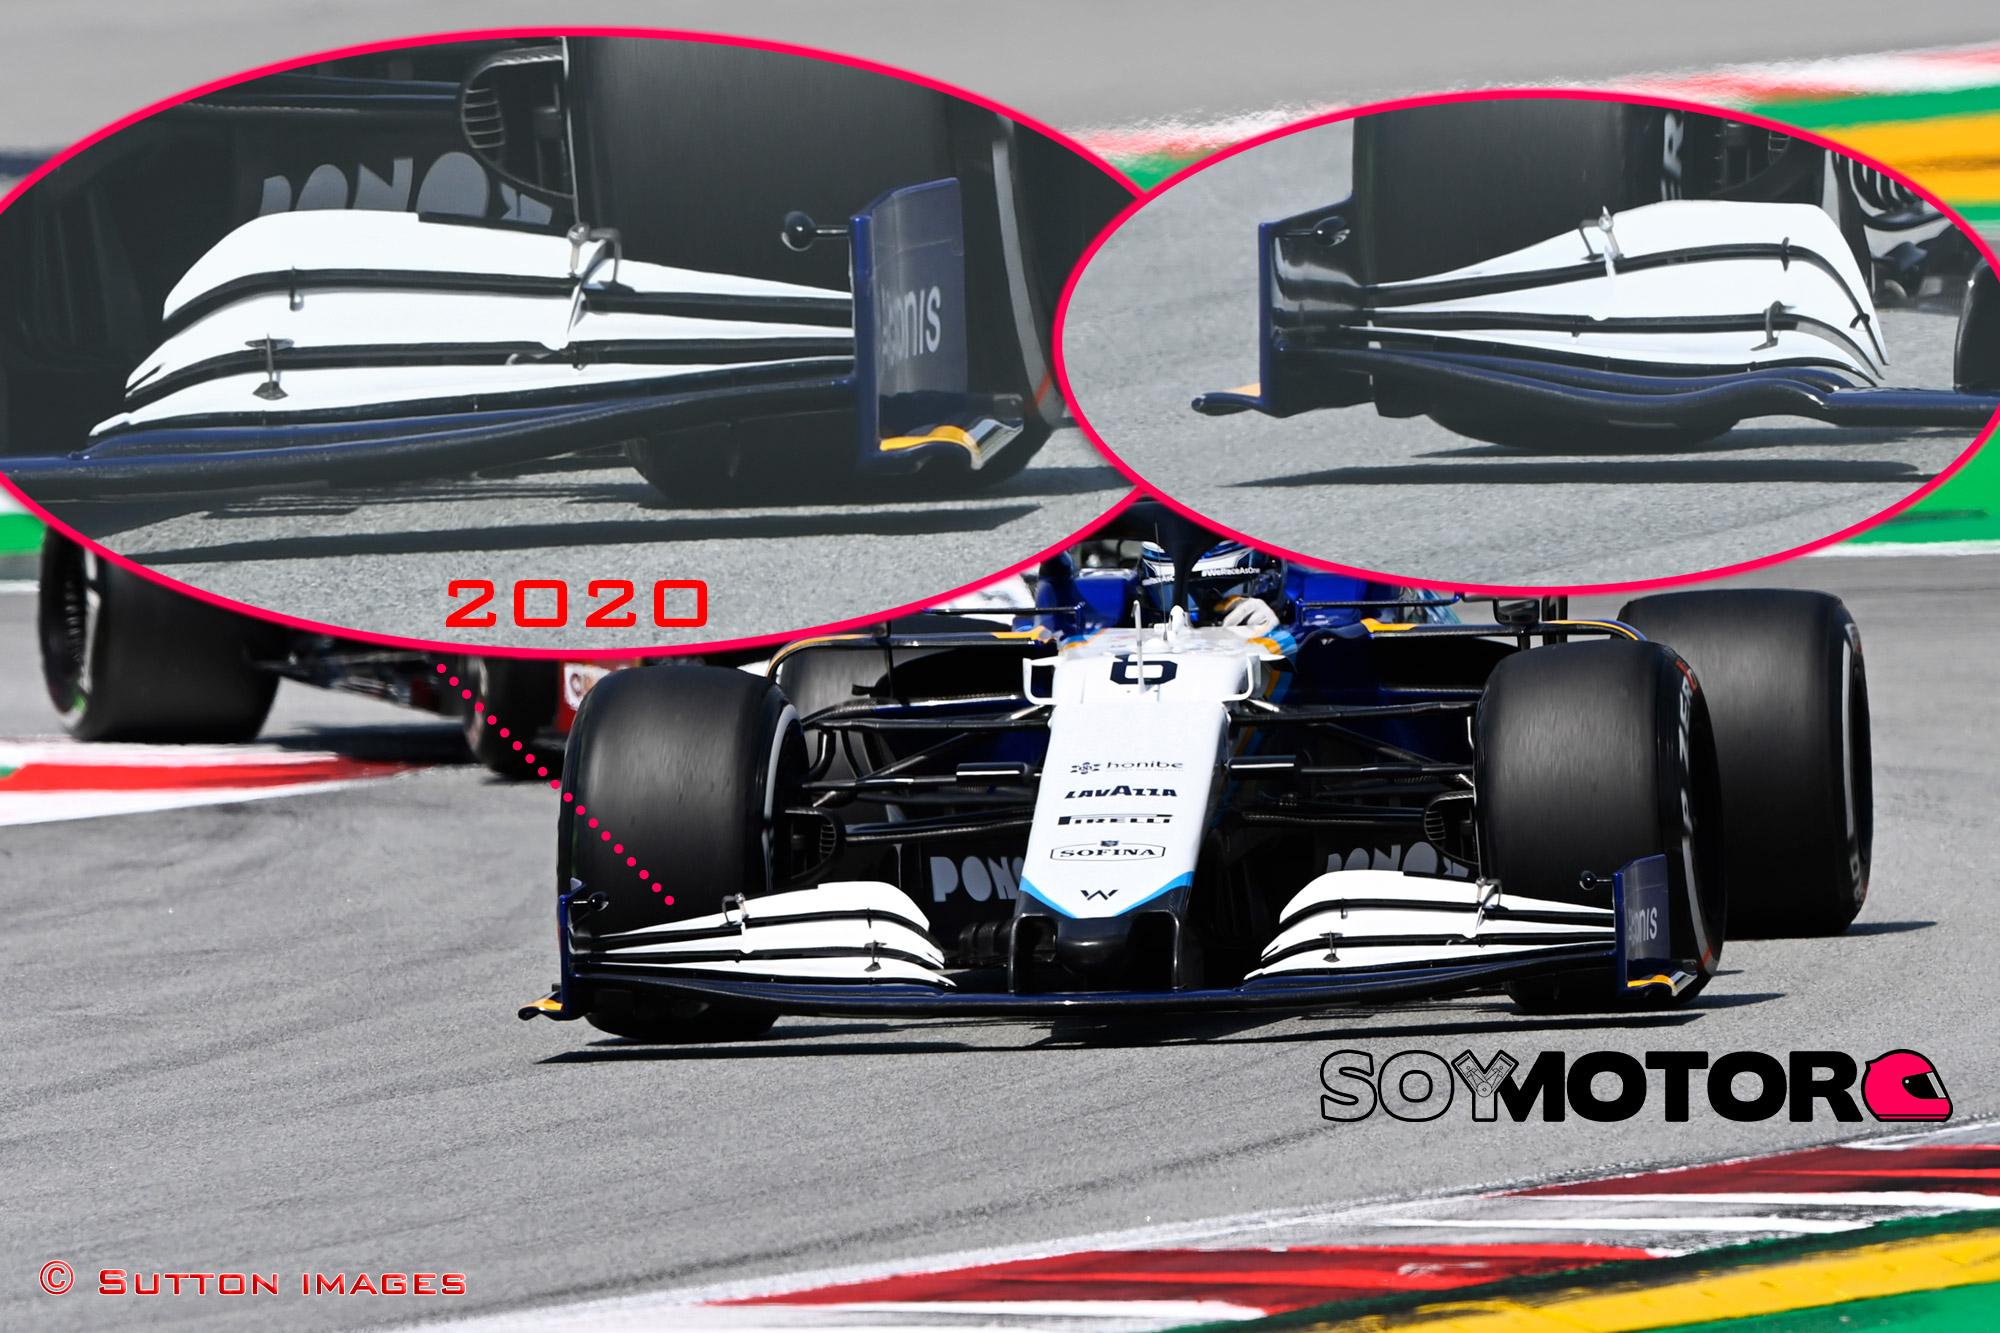 williams-dos-alas-delanteras-soymotor_0.jpg